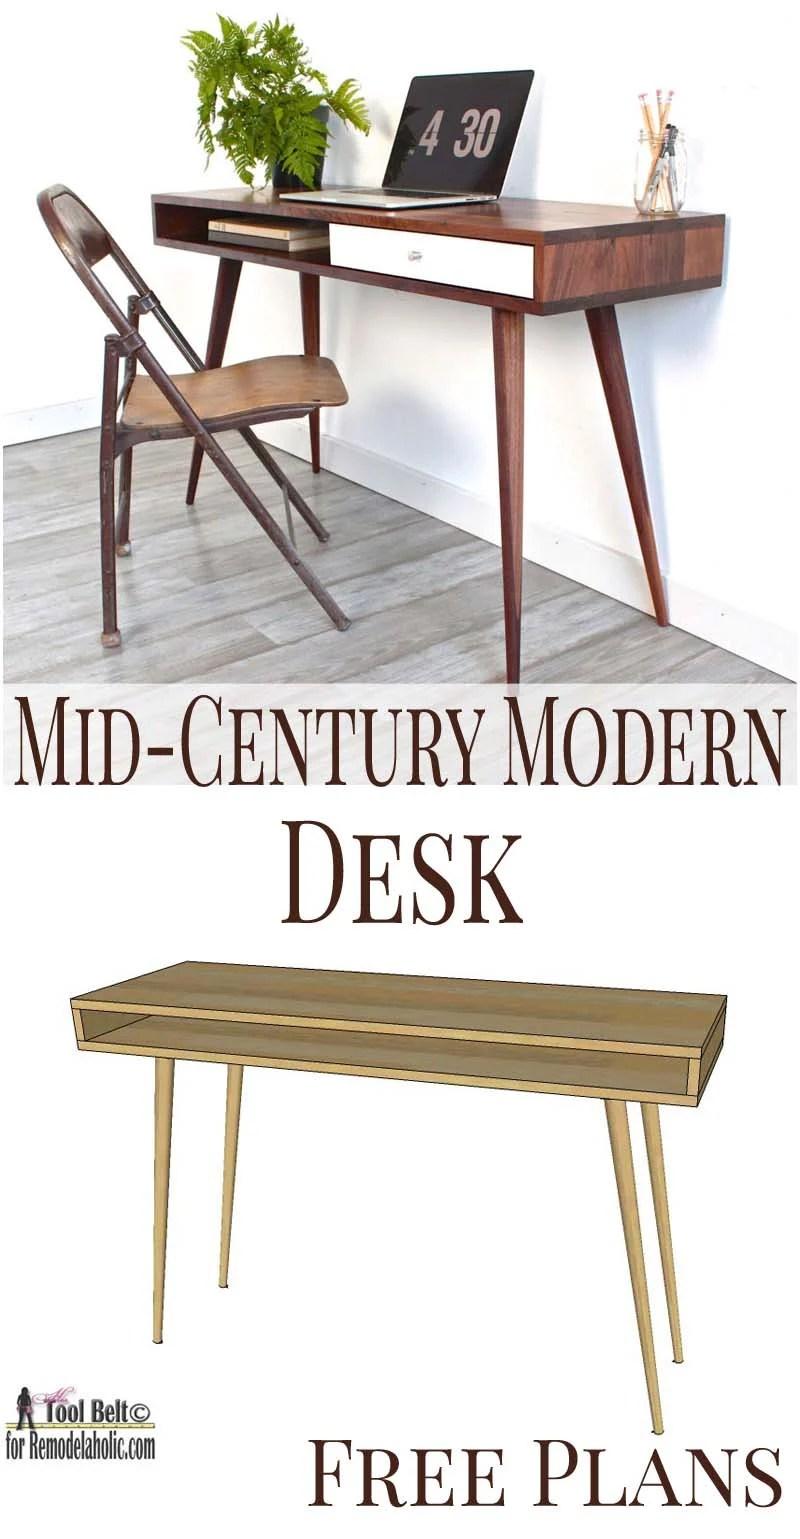 Pleasing Remodelaholic Diy Mid Century Modern Desk Squirreltailoven Fun Painted Chair Ideas Images Squirreltailovenorg